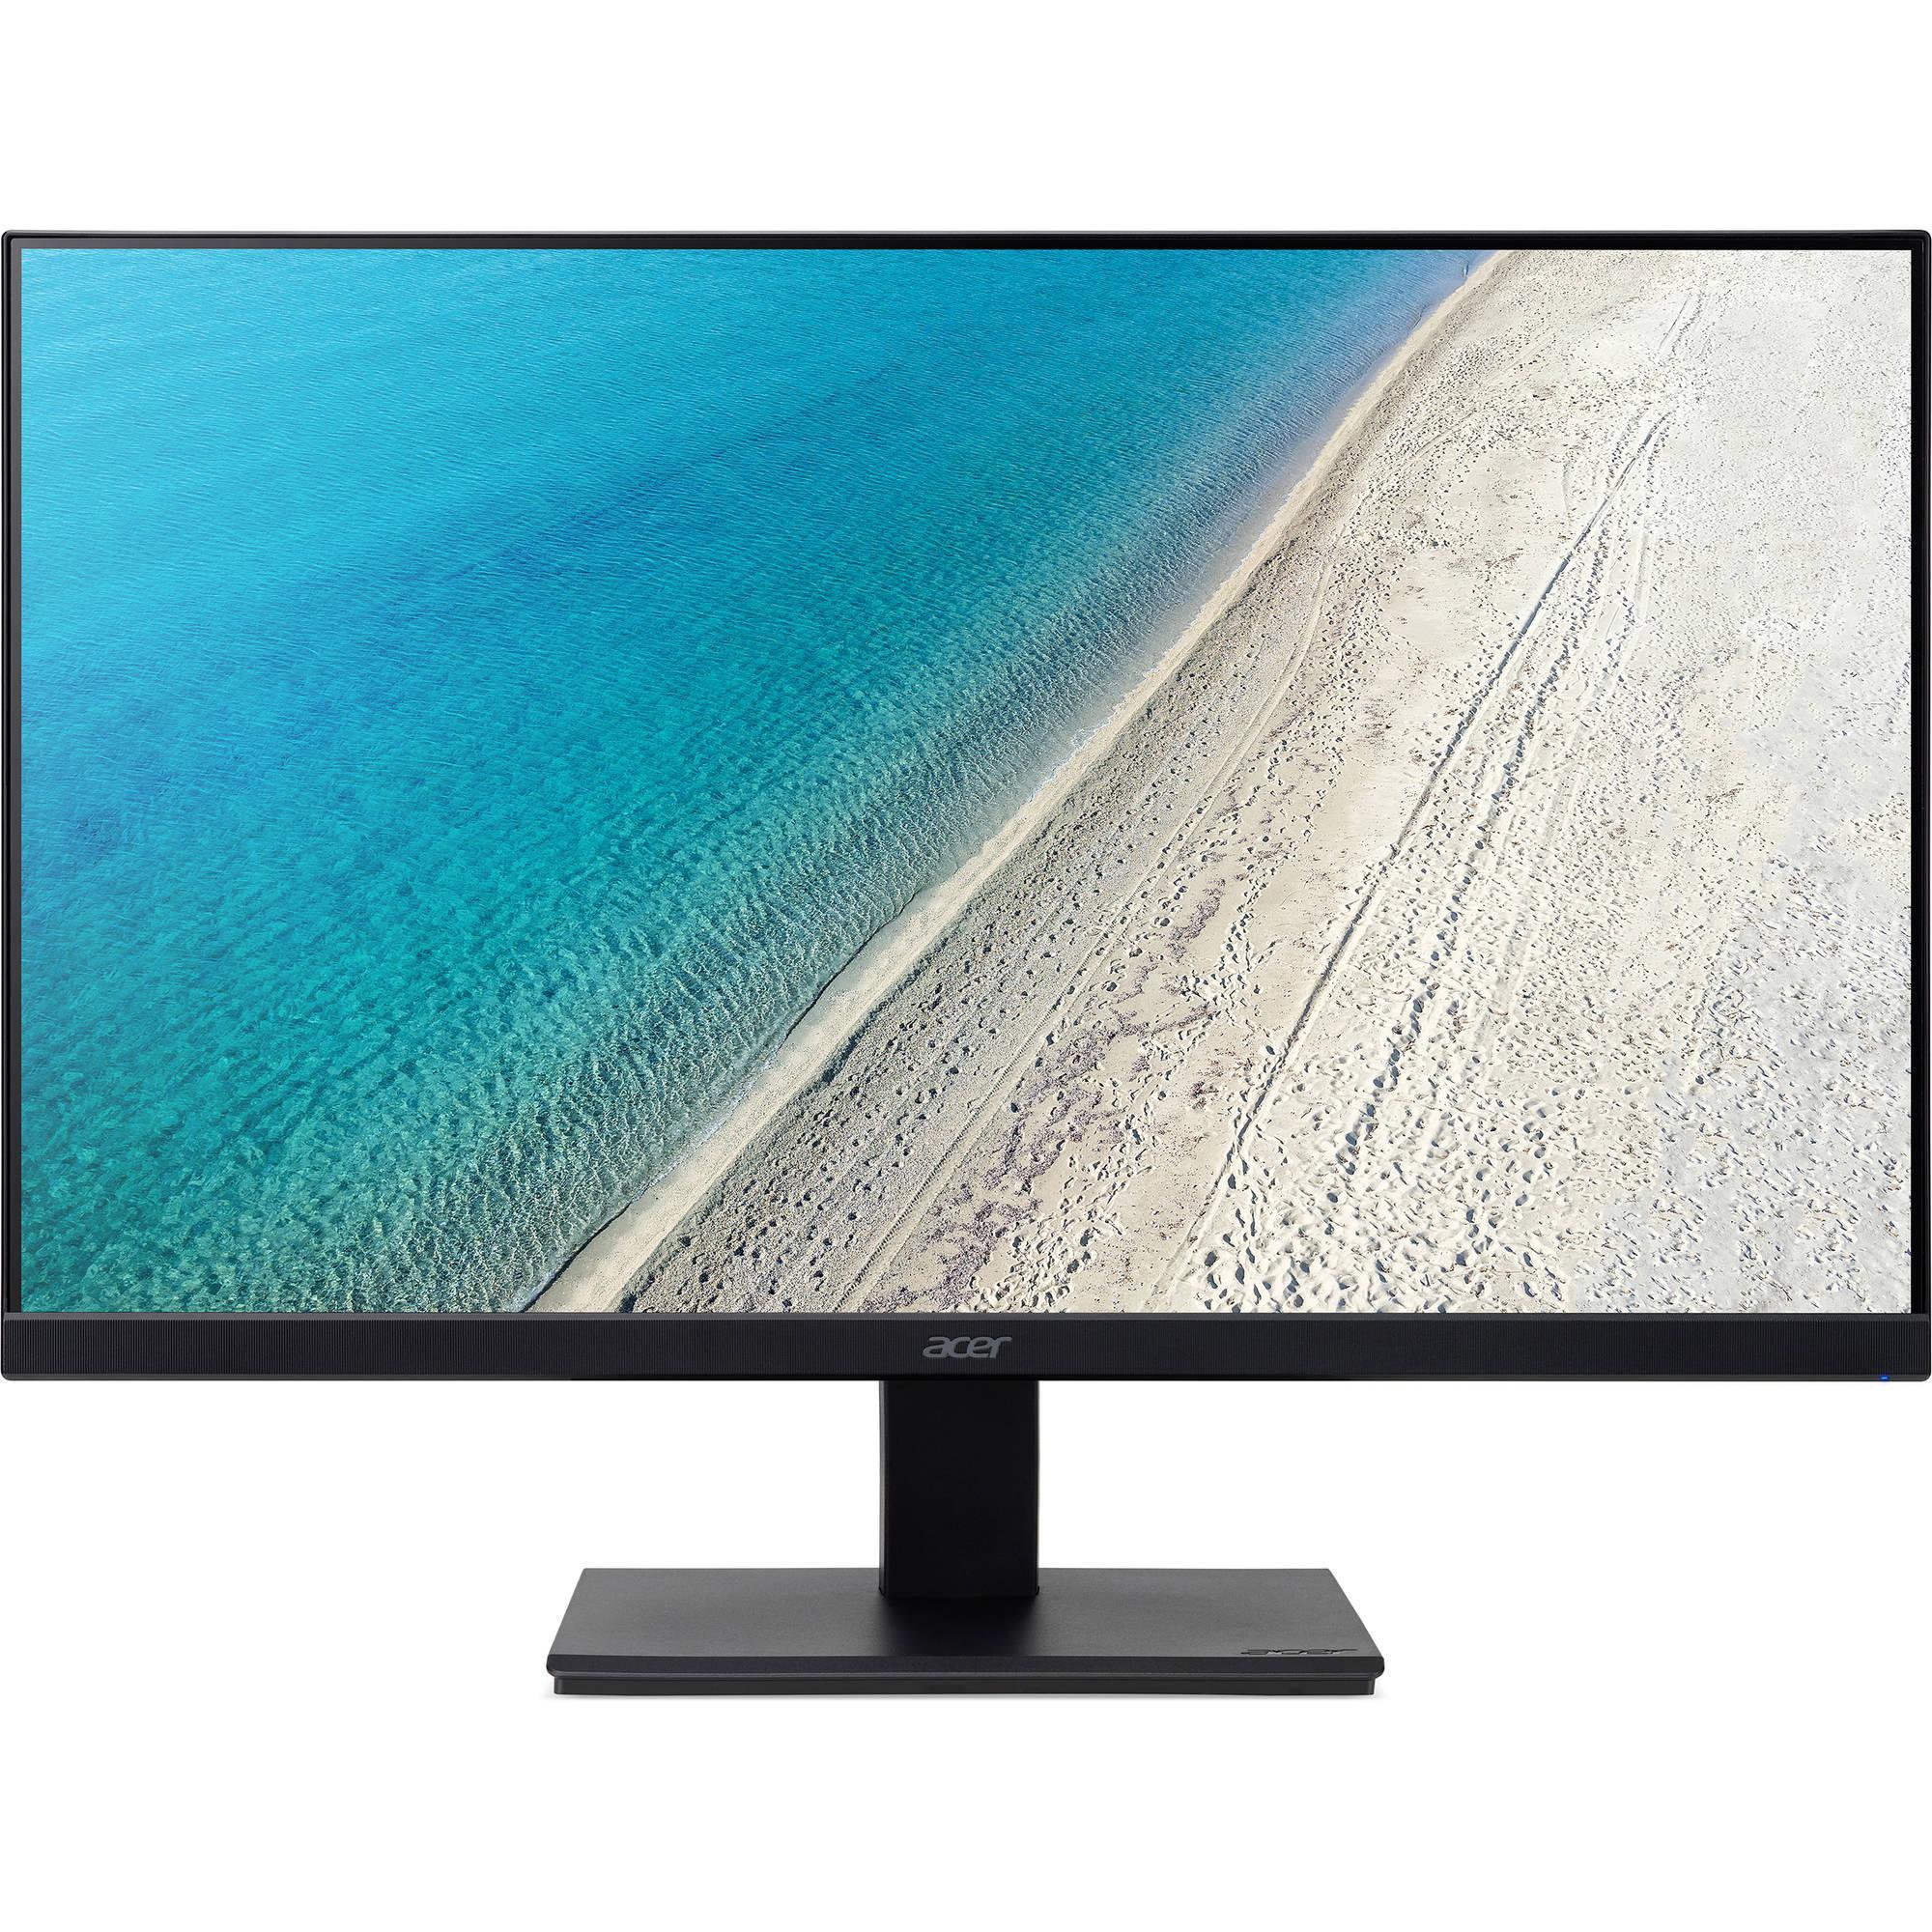 Acer 22.5-inch 1920 x 1080 FHD Monitor (V227Q)